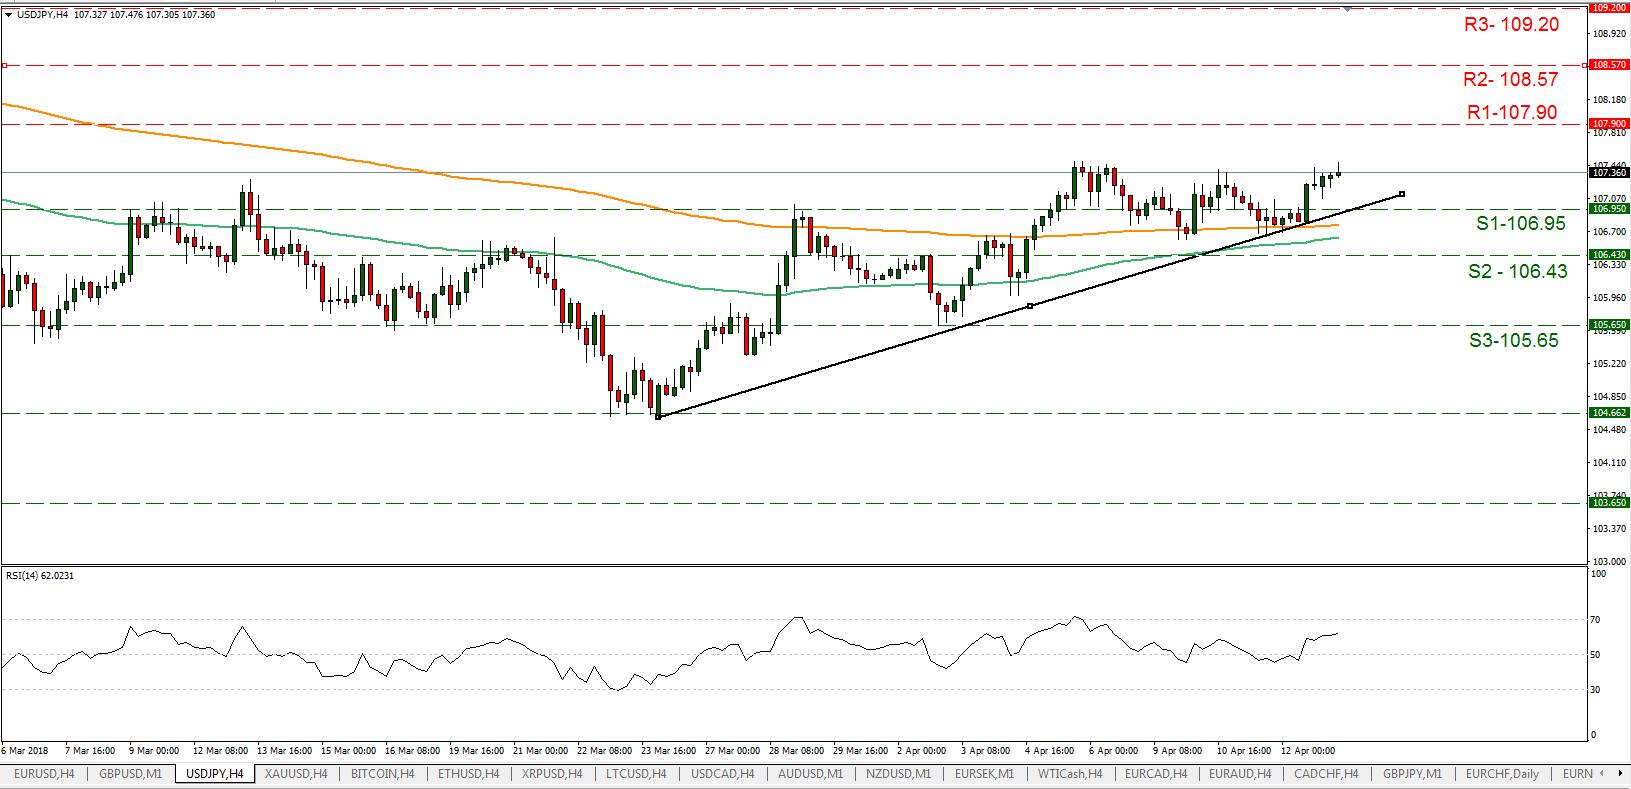 USD/JPY 13/04/2018 | EconAlerts